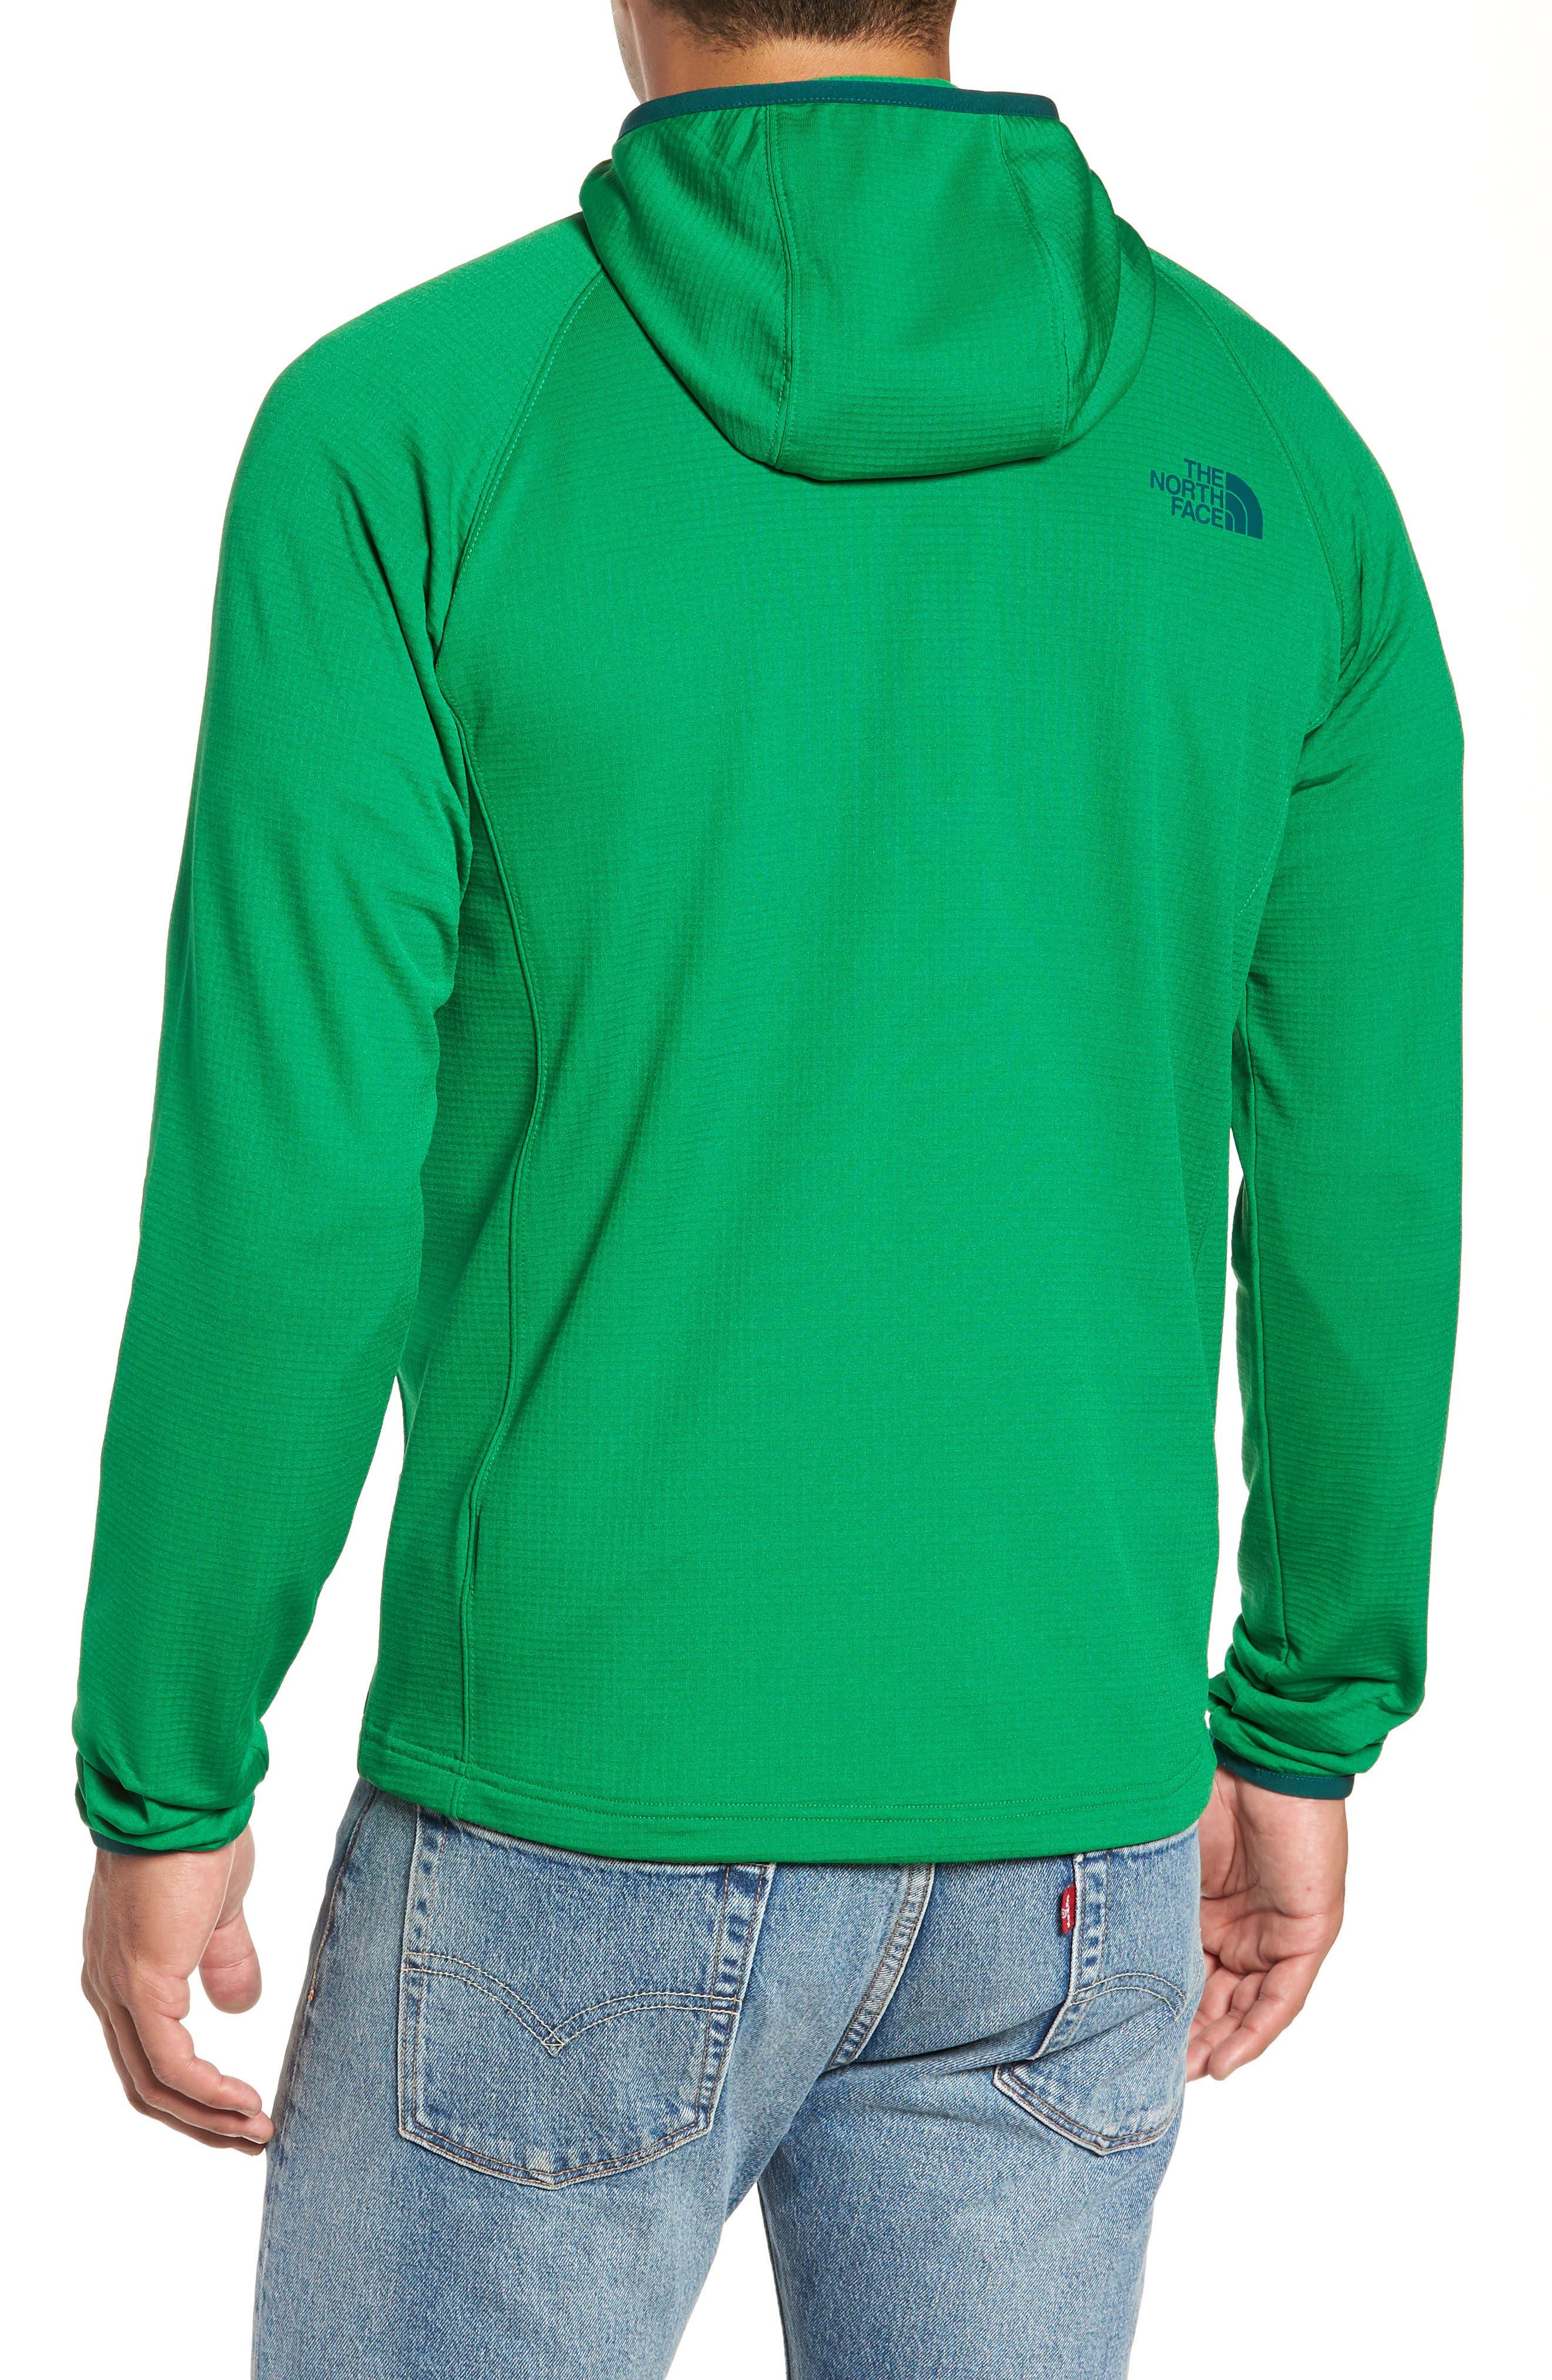 Borod Zip Fleece Jacket,                             Alternate thumbnail 2, color,                             PRIMARY GREEN/GARDEN GREEN